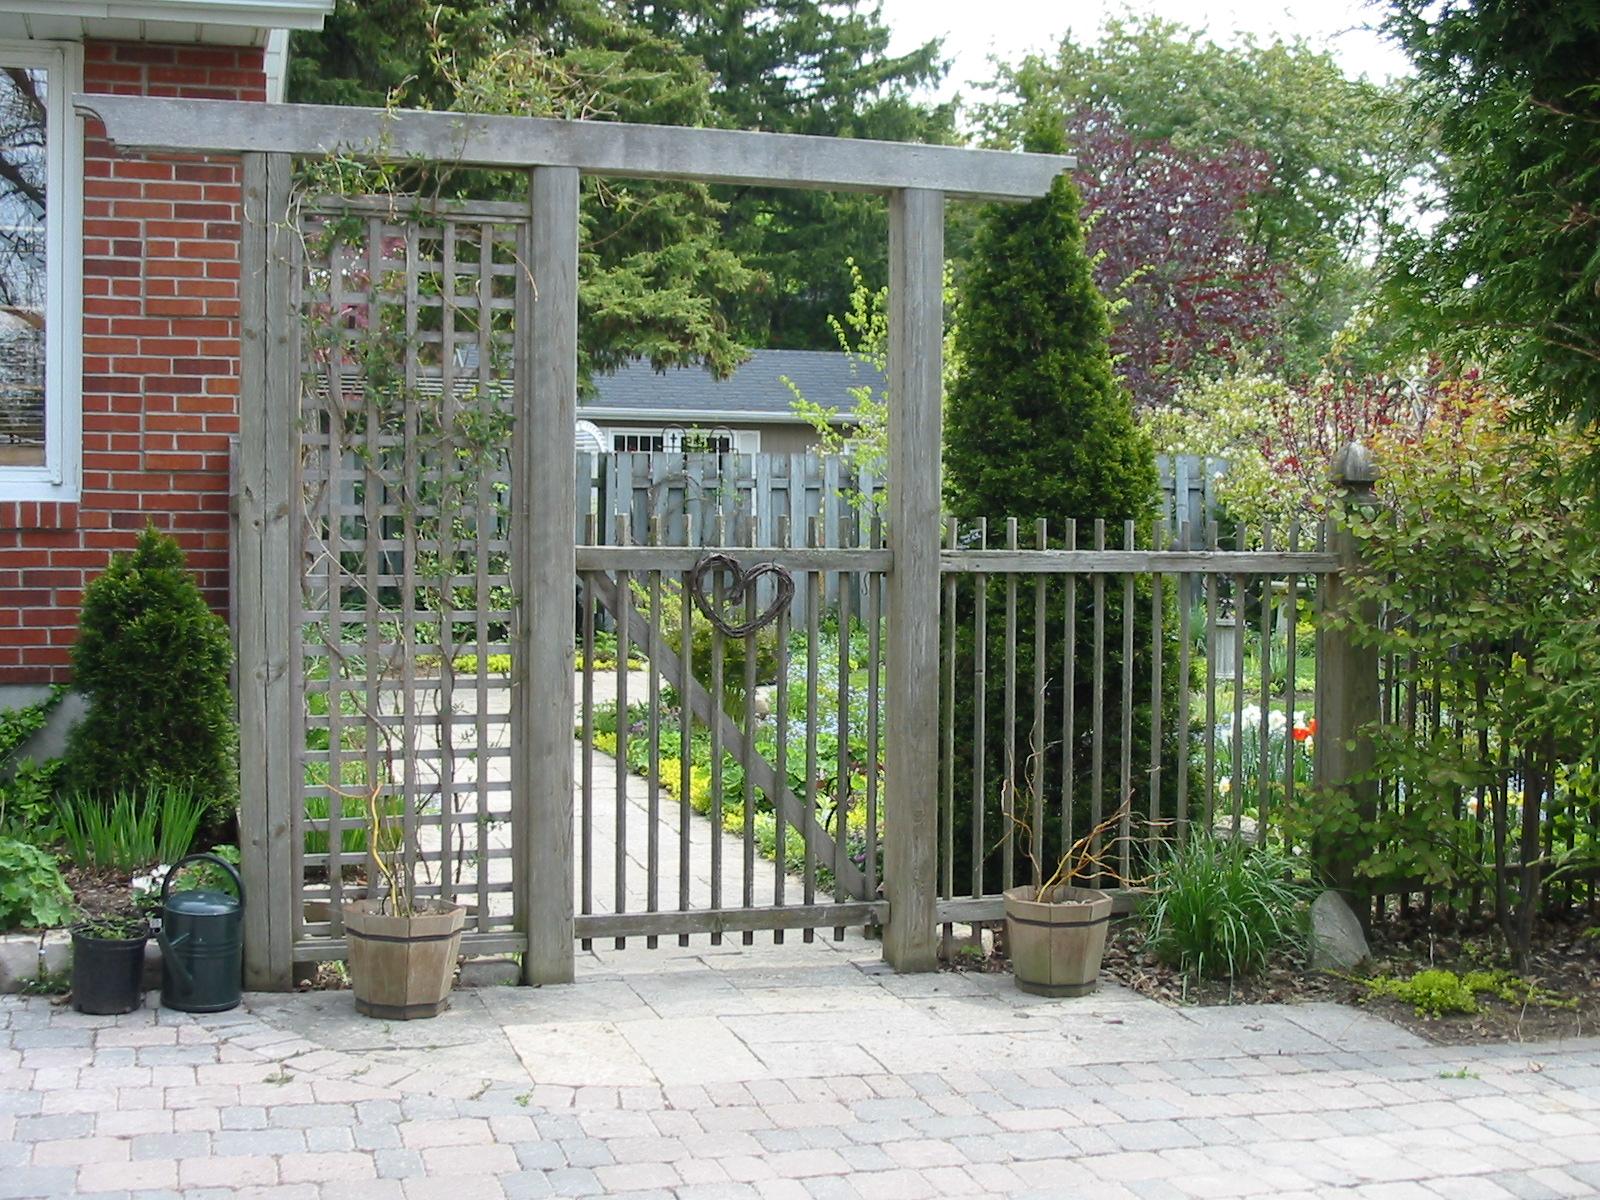 Cedar gate and fence